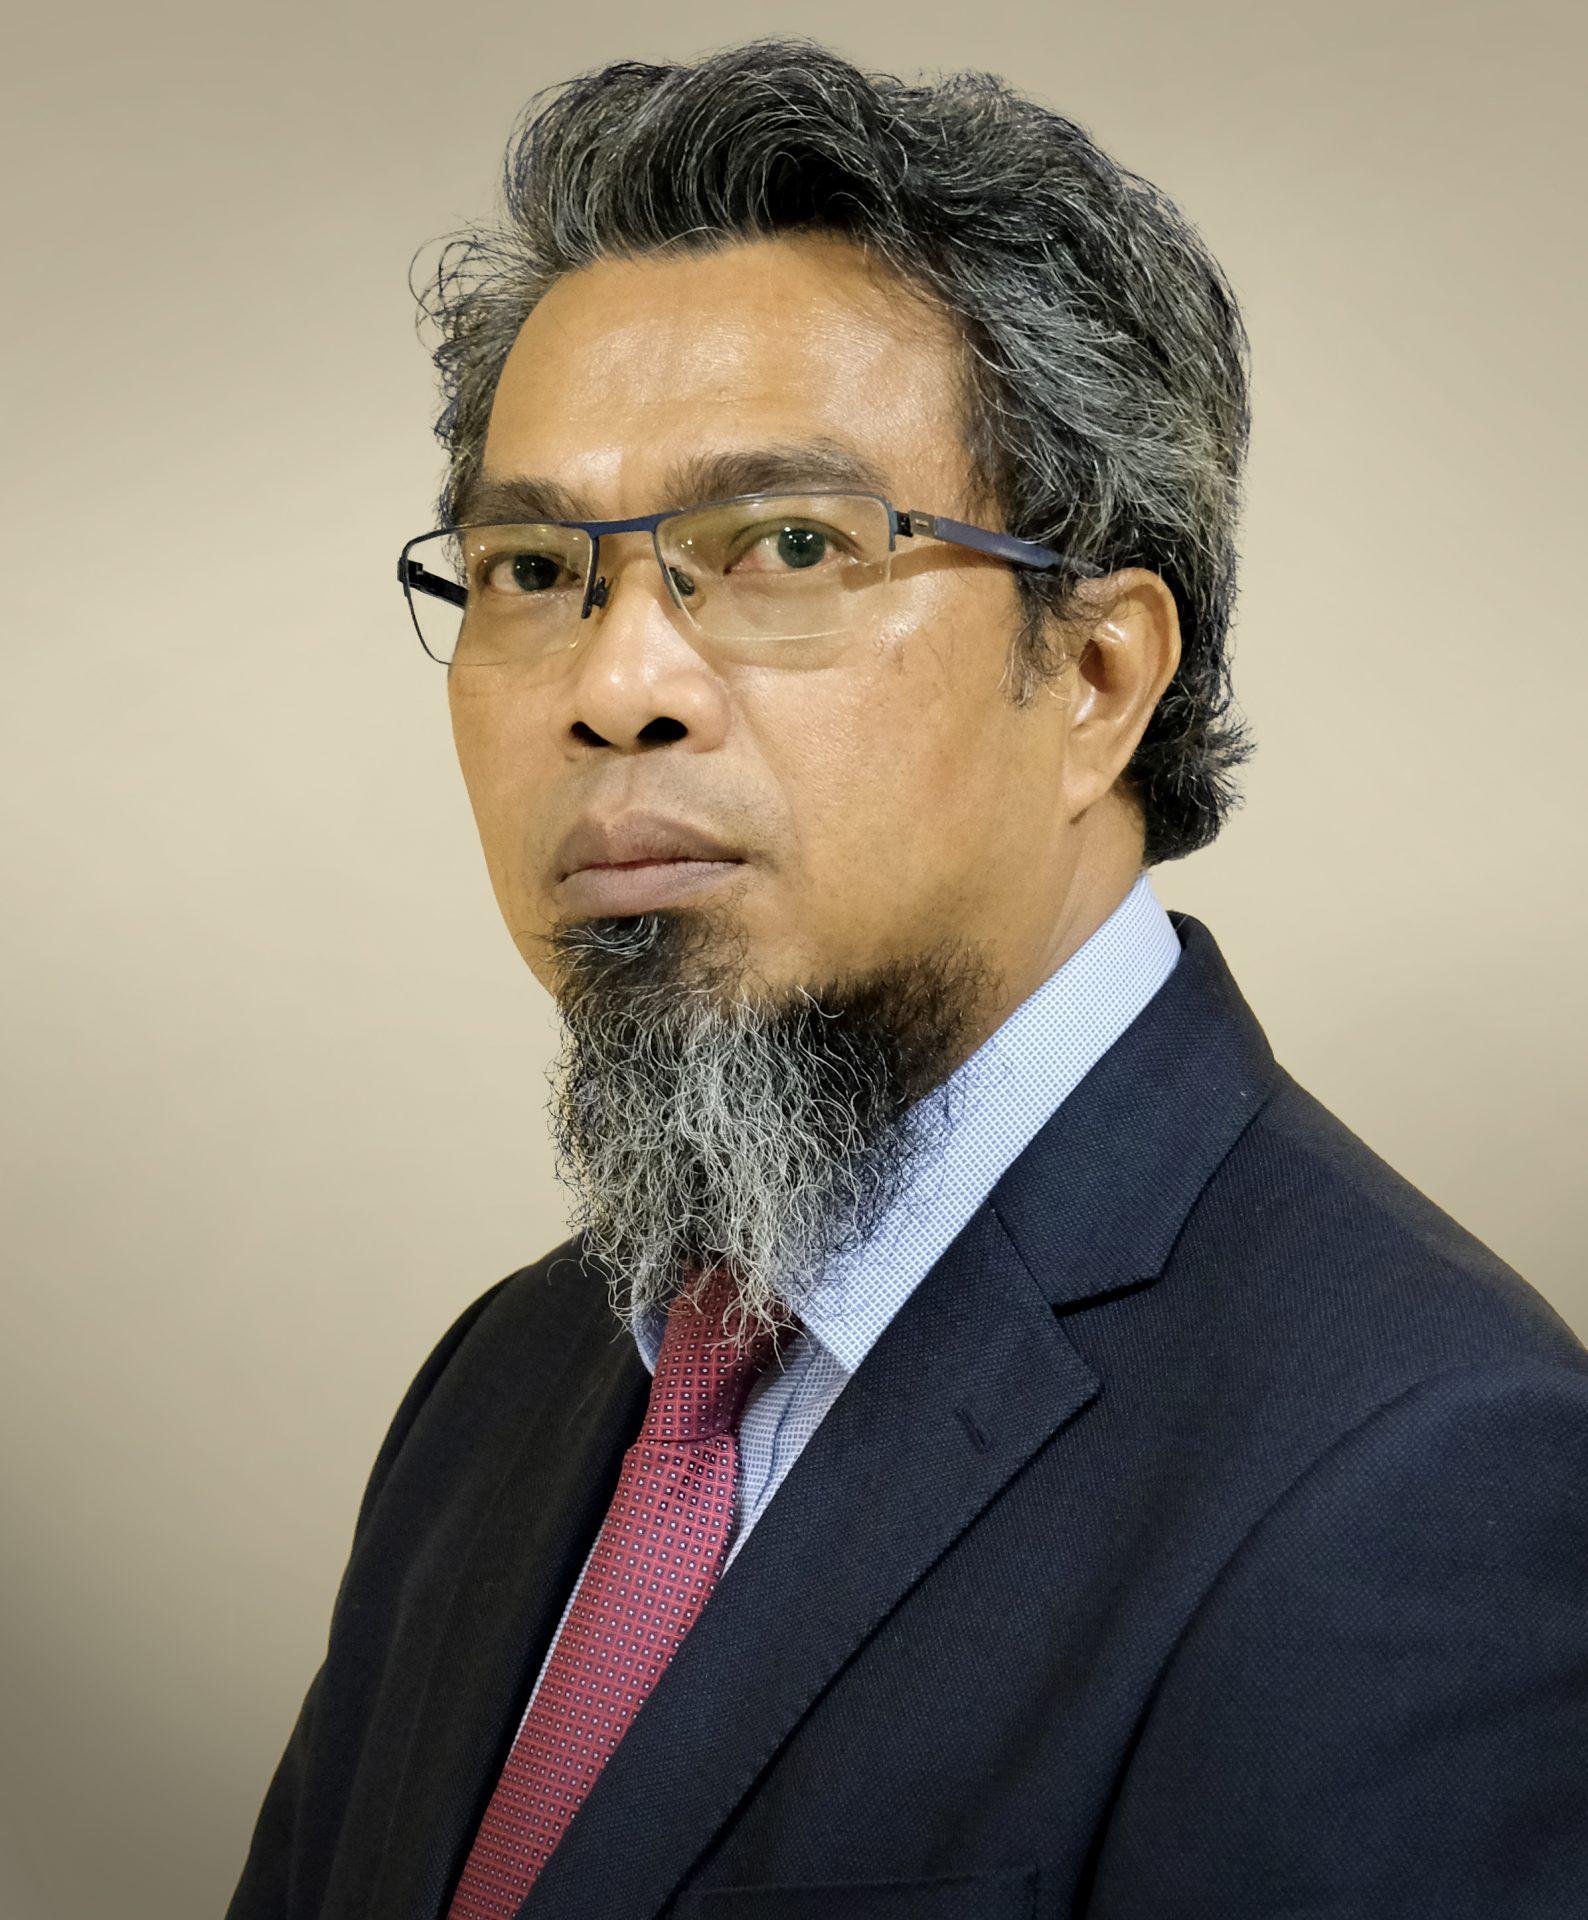 Chairil bin Mohd Tamil - BOD